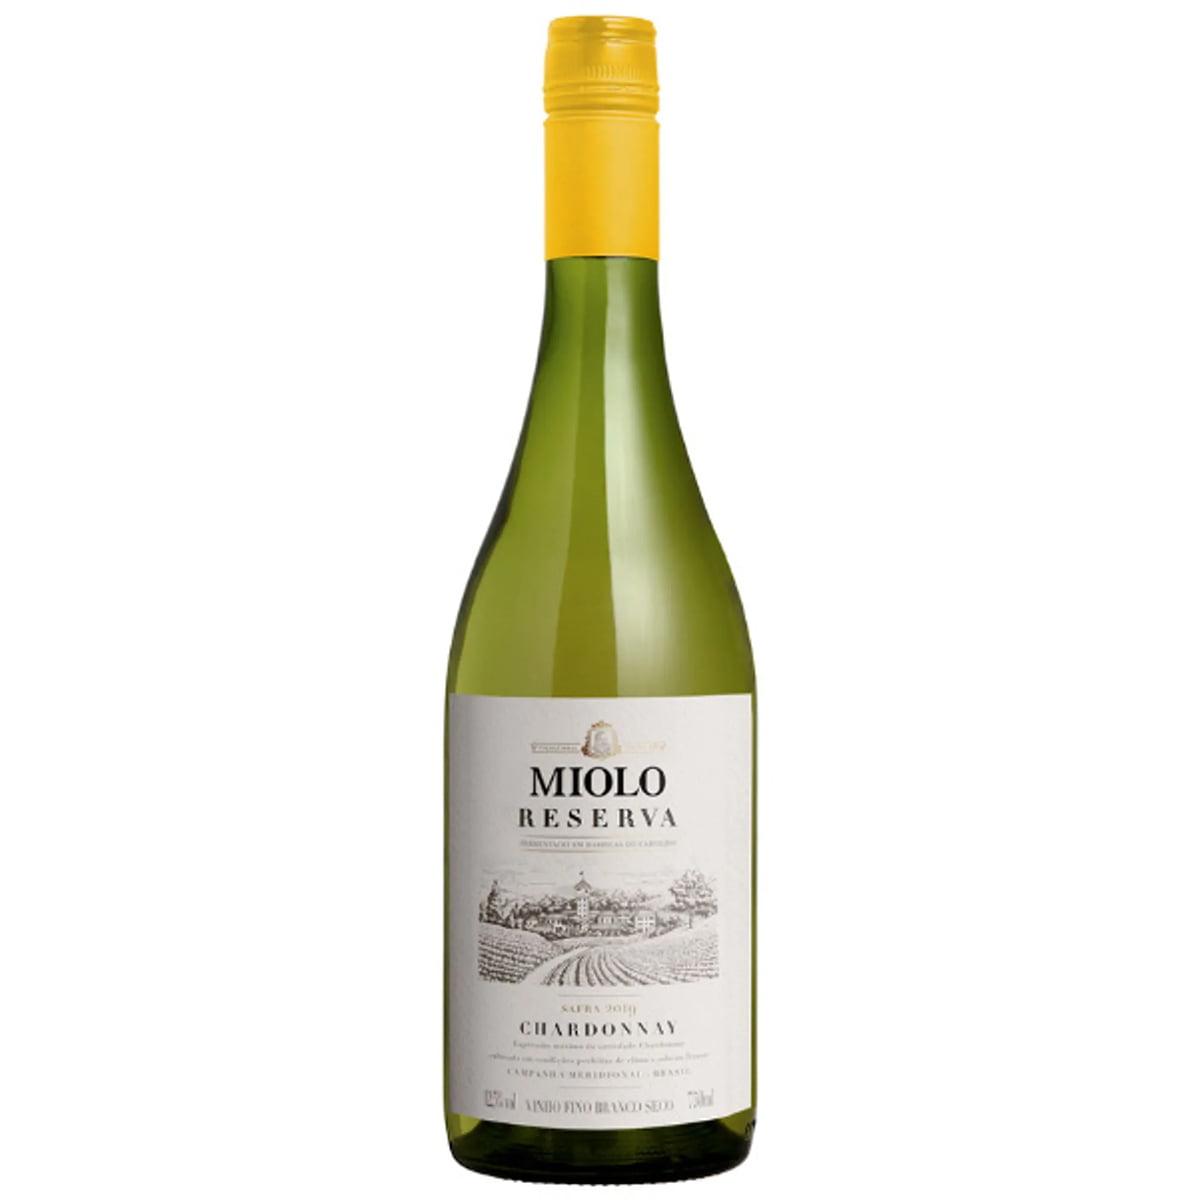 Vinho Miolo Reserva Chardonnay Branco Seco 750ml